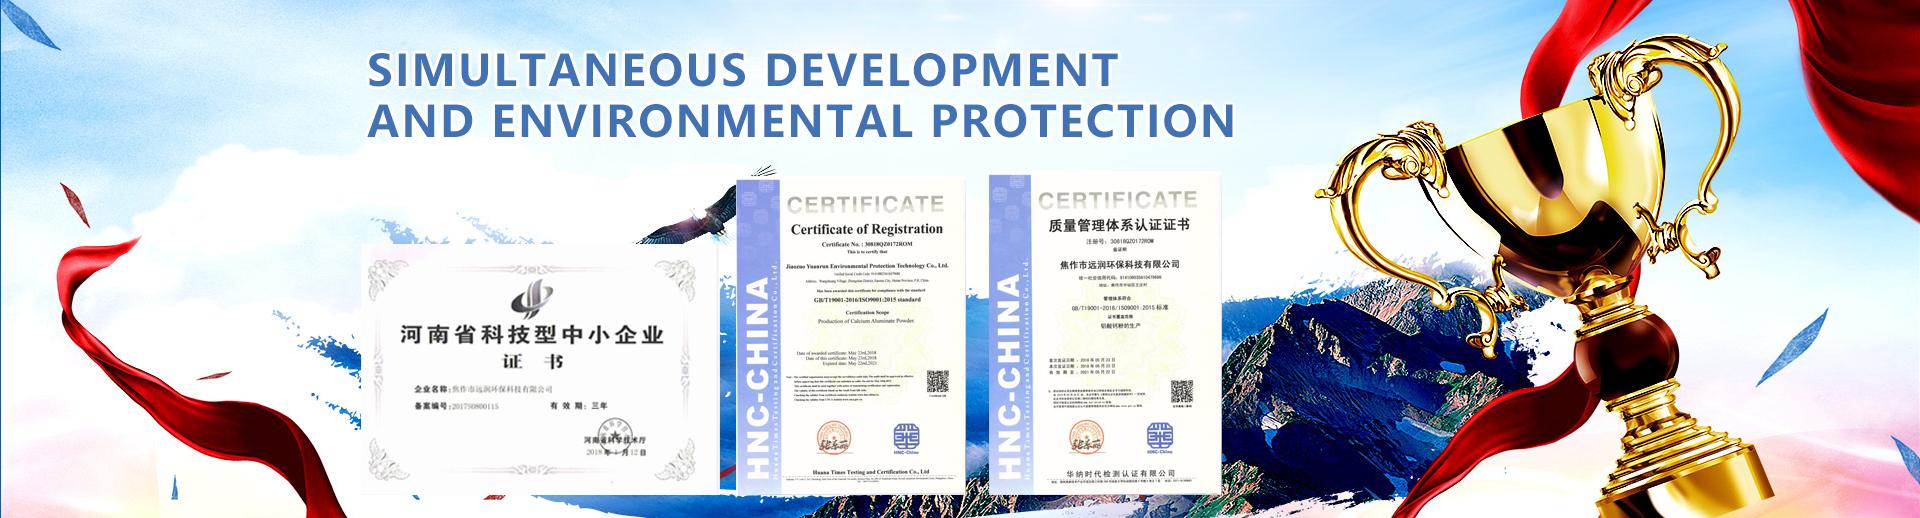 JIAOZUO YUANRUN ENVIRONMENGTAL PROTECTION TECHNOLOGY CO.,LTE